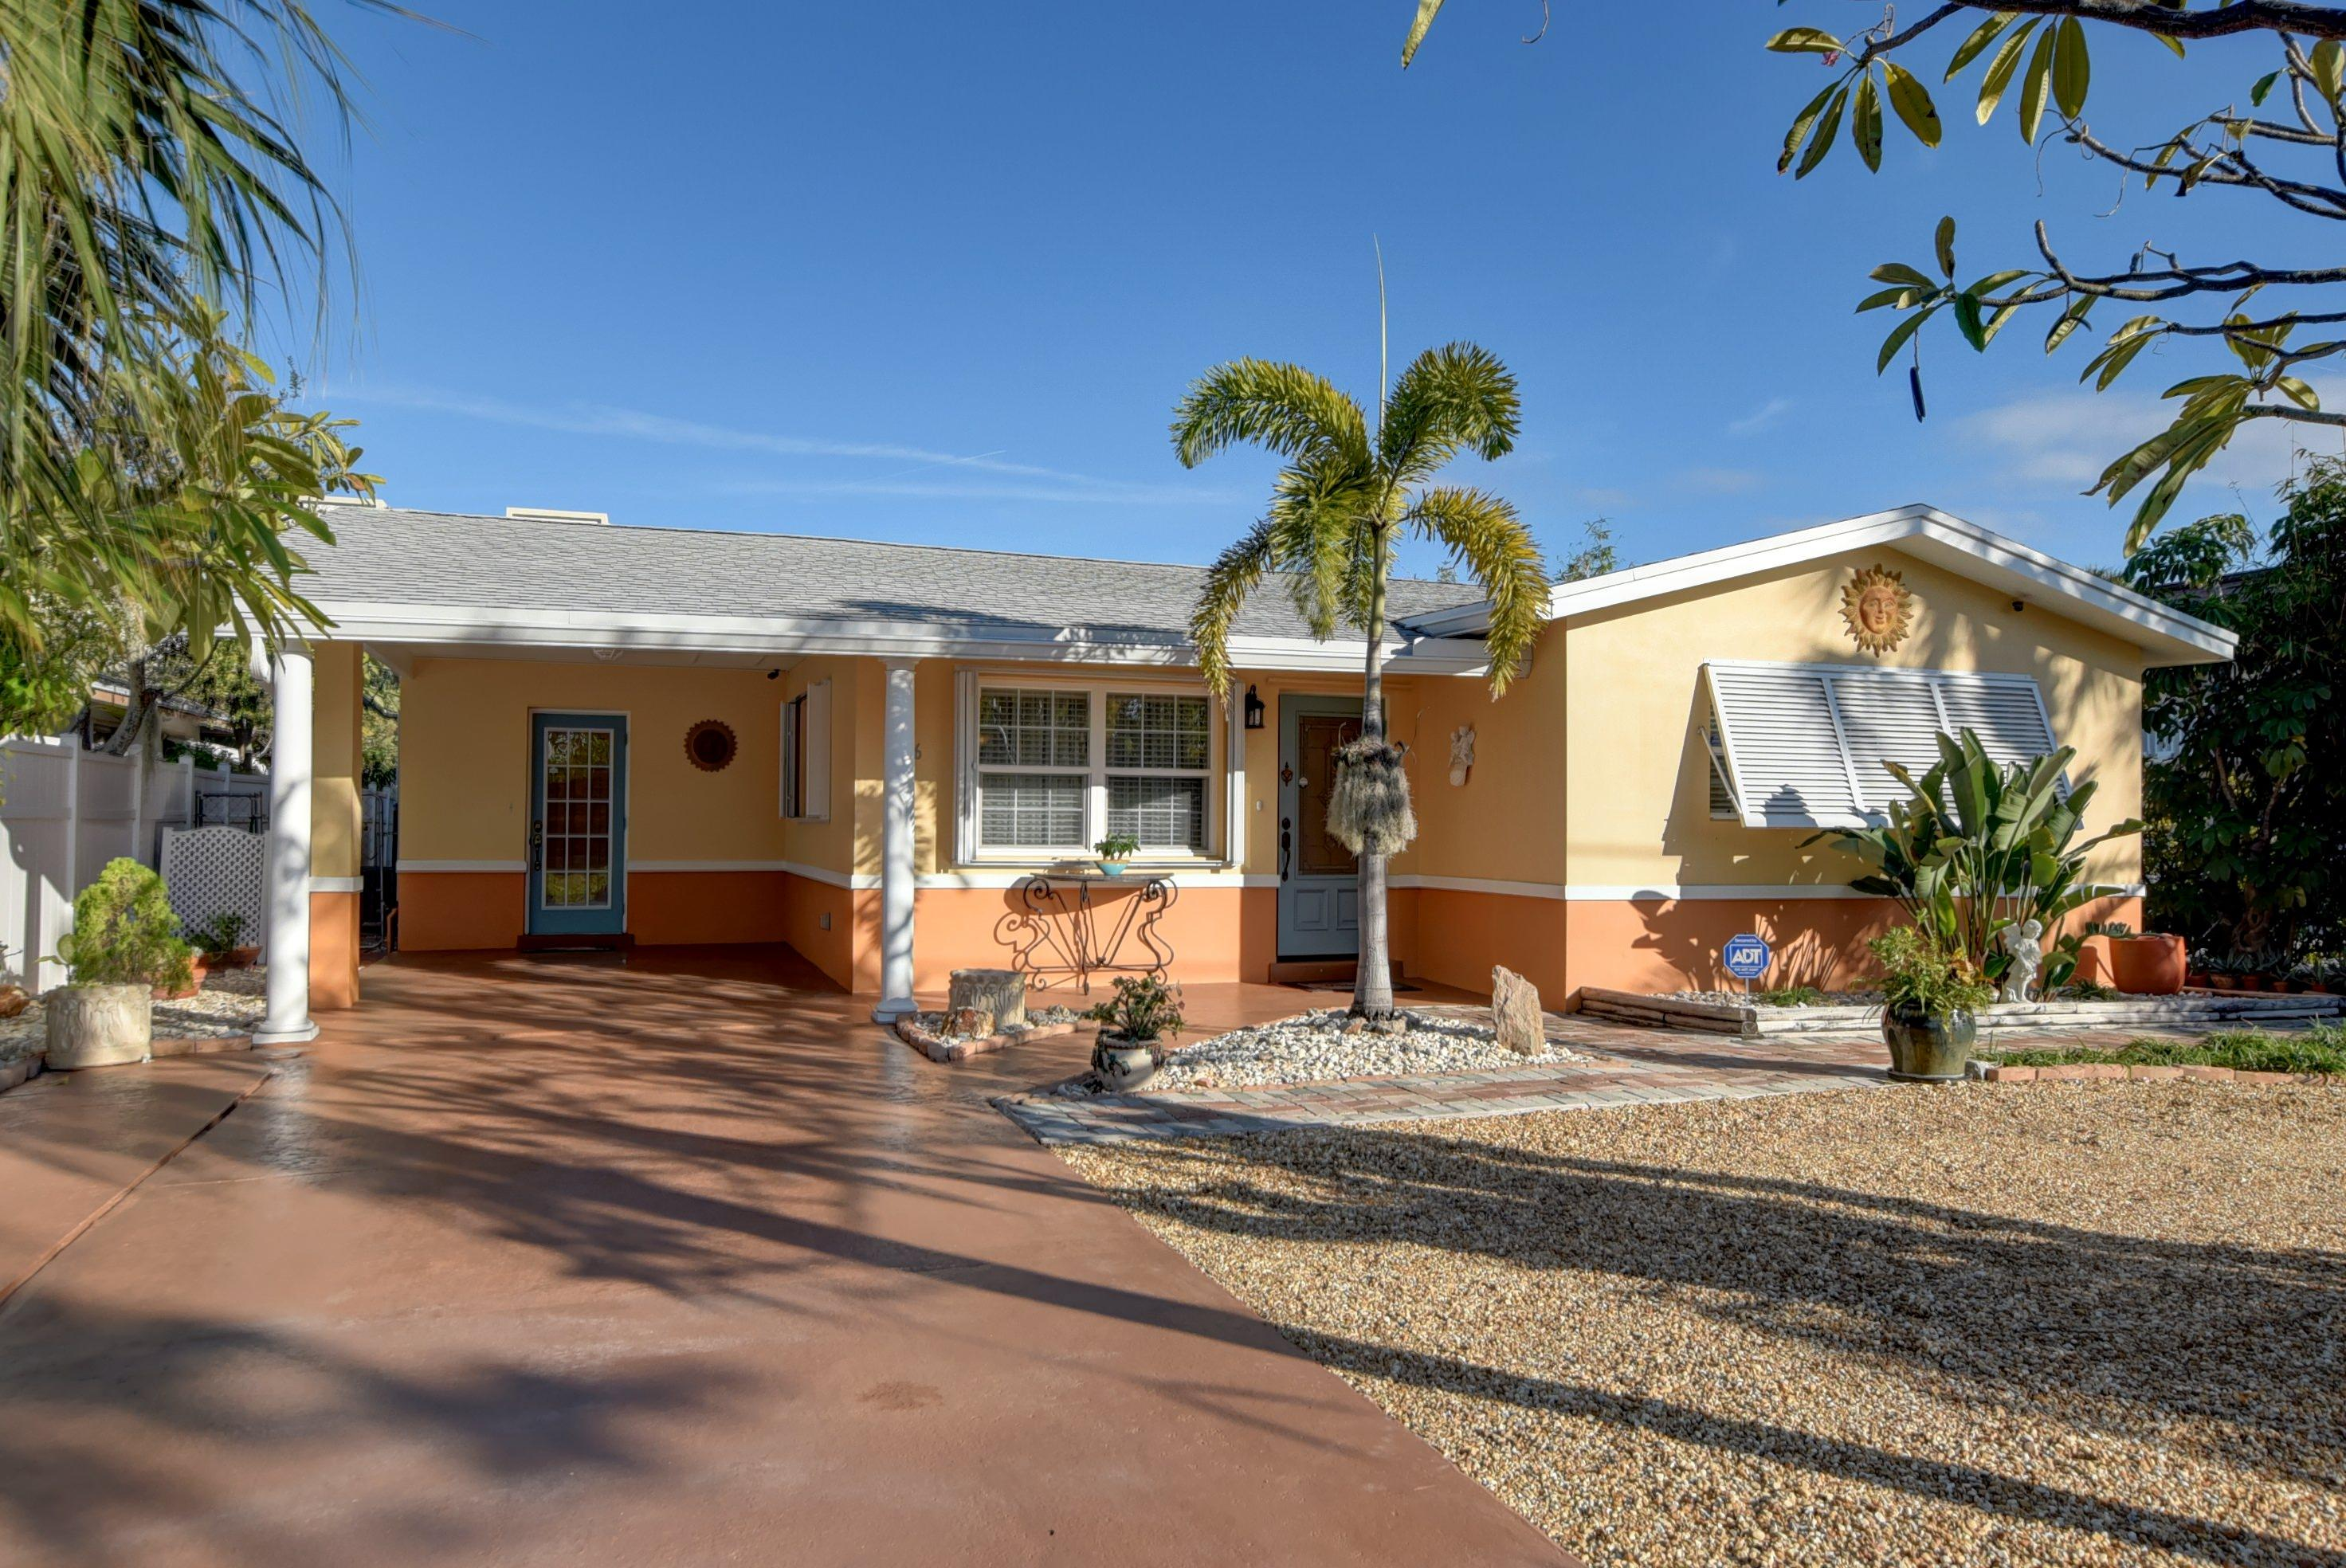 Home for sale in Lantana Cove / Greynolds Highlands Lantana Florida